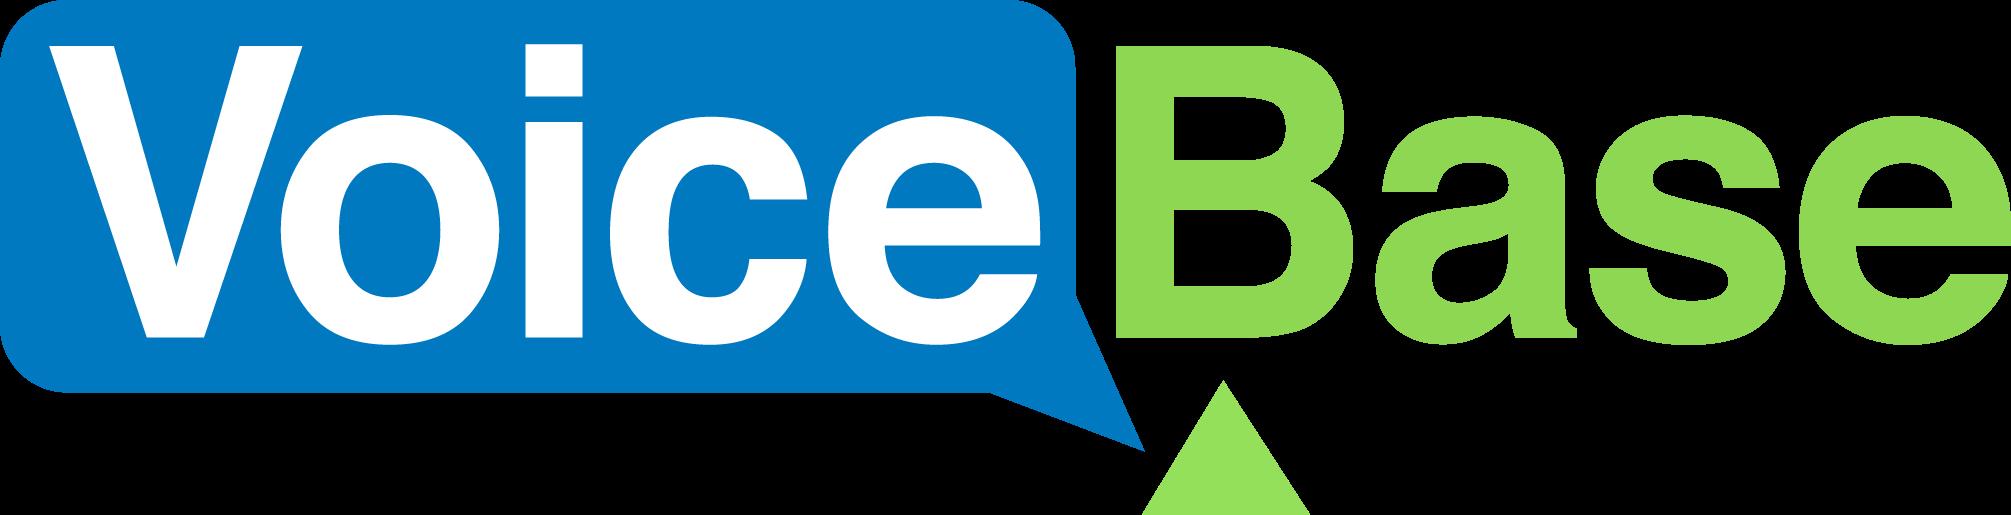 voicebase-logo-2-2